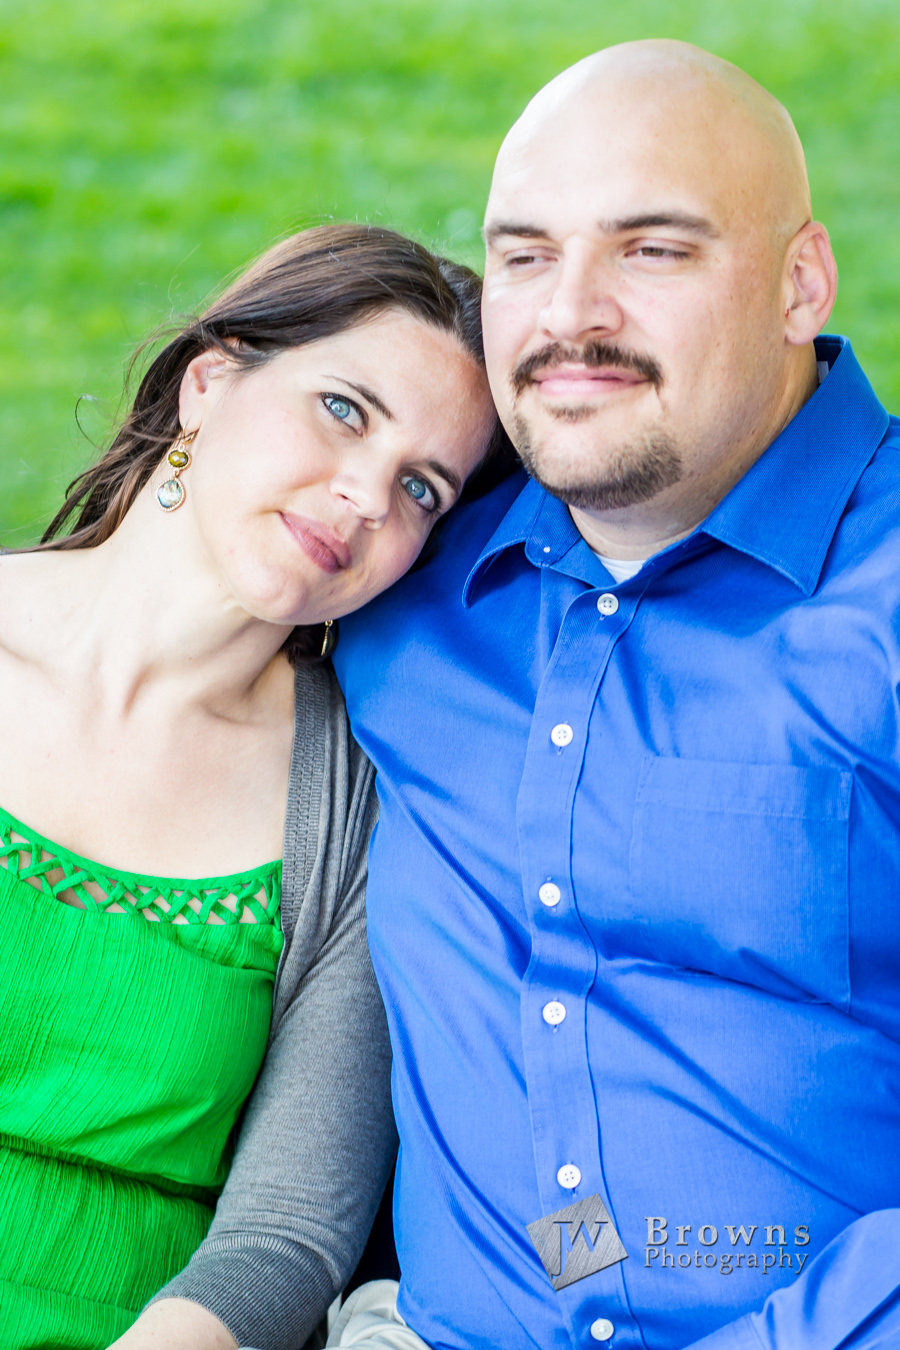 engagementportraits-3.jpg